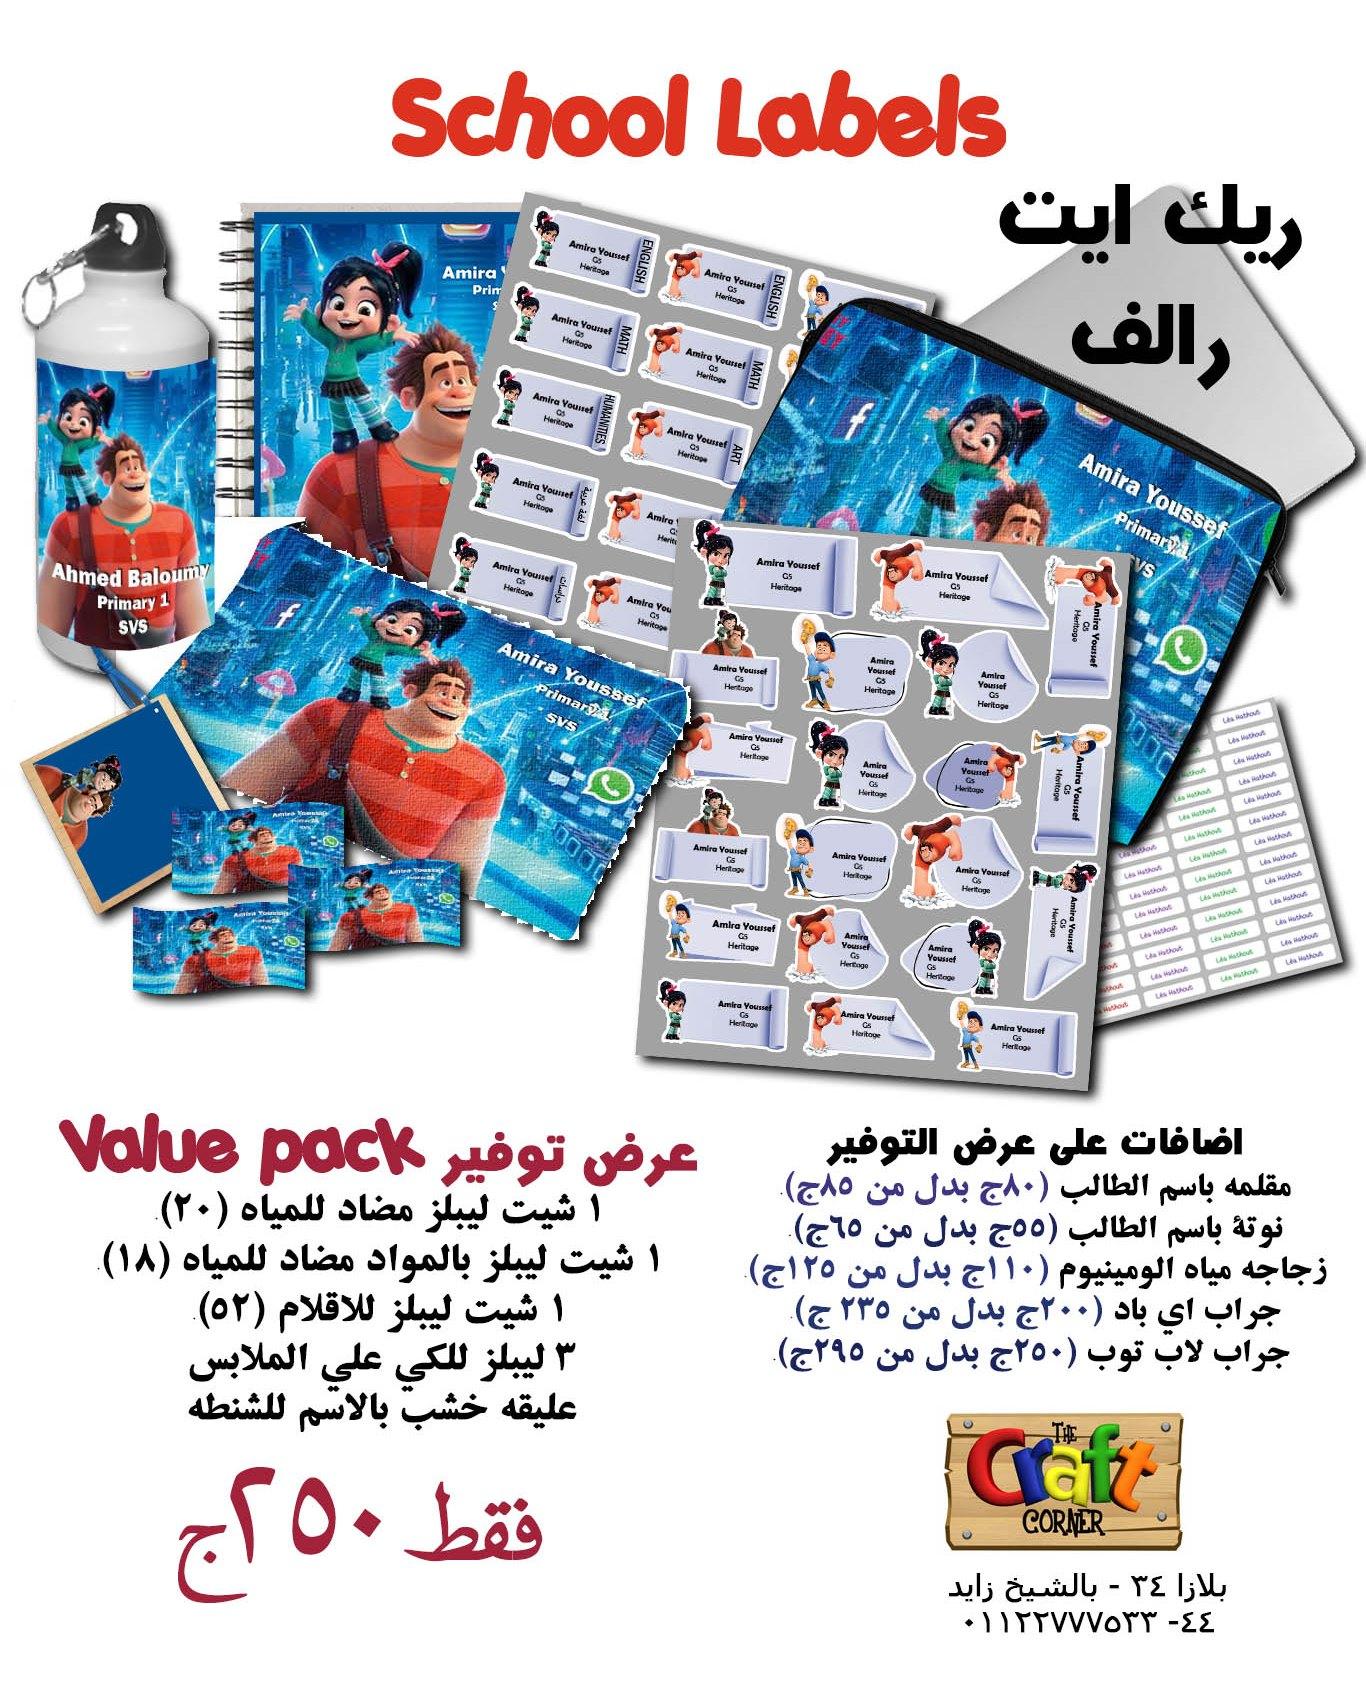 Wreck it ralph ad arabic